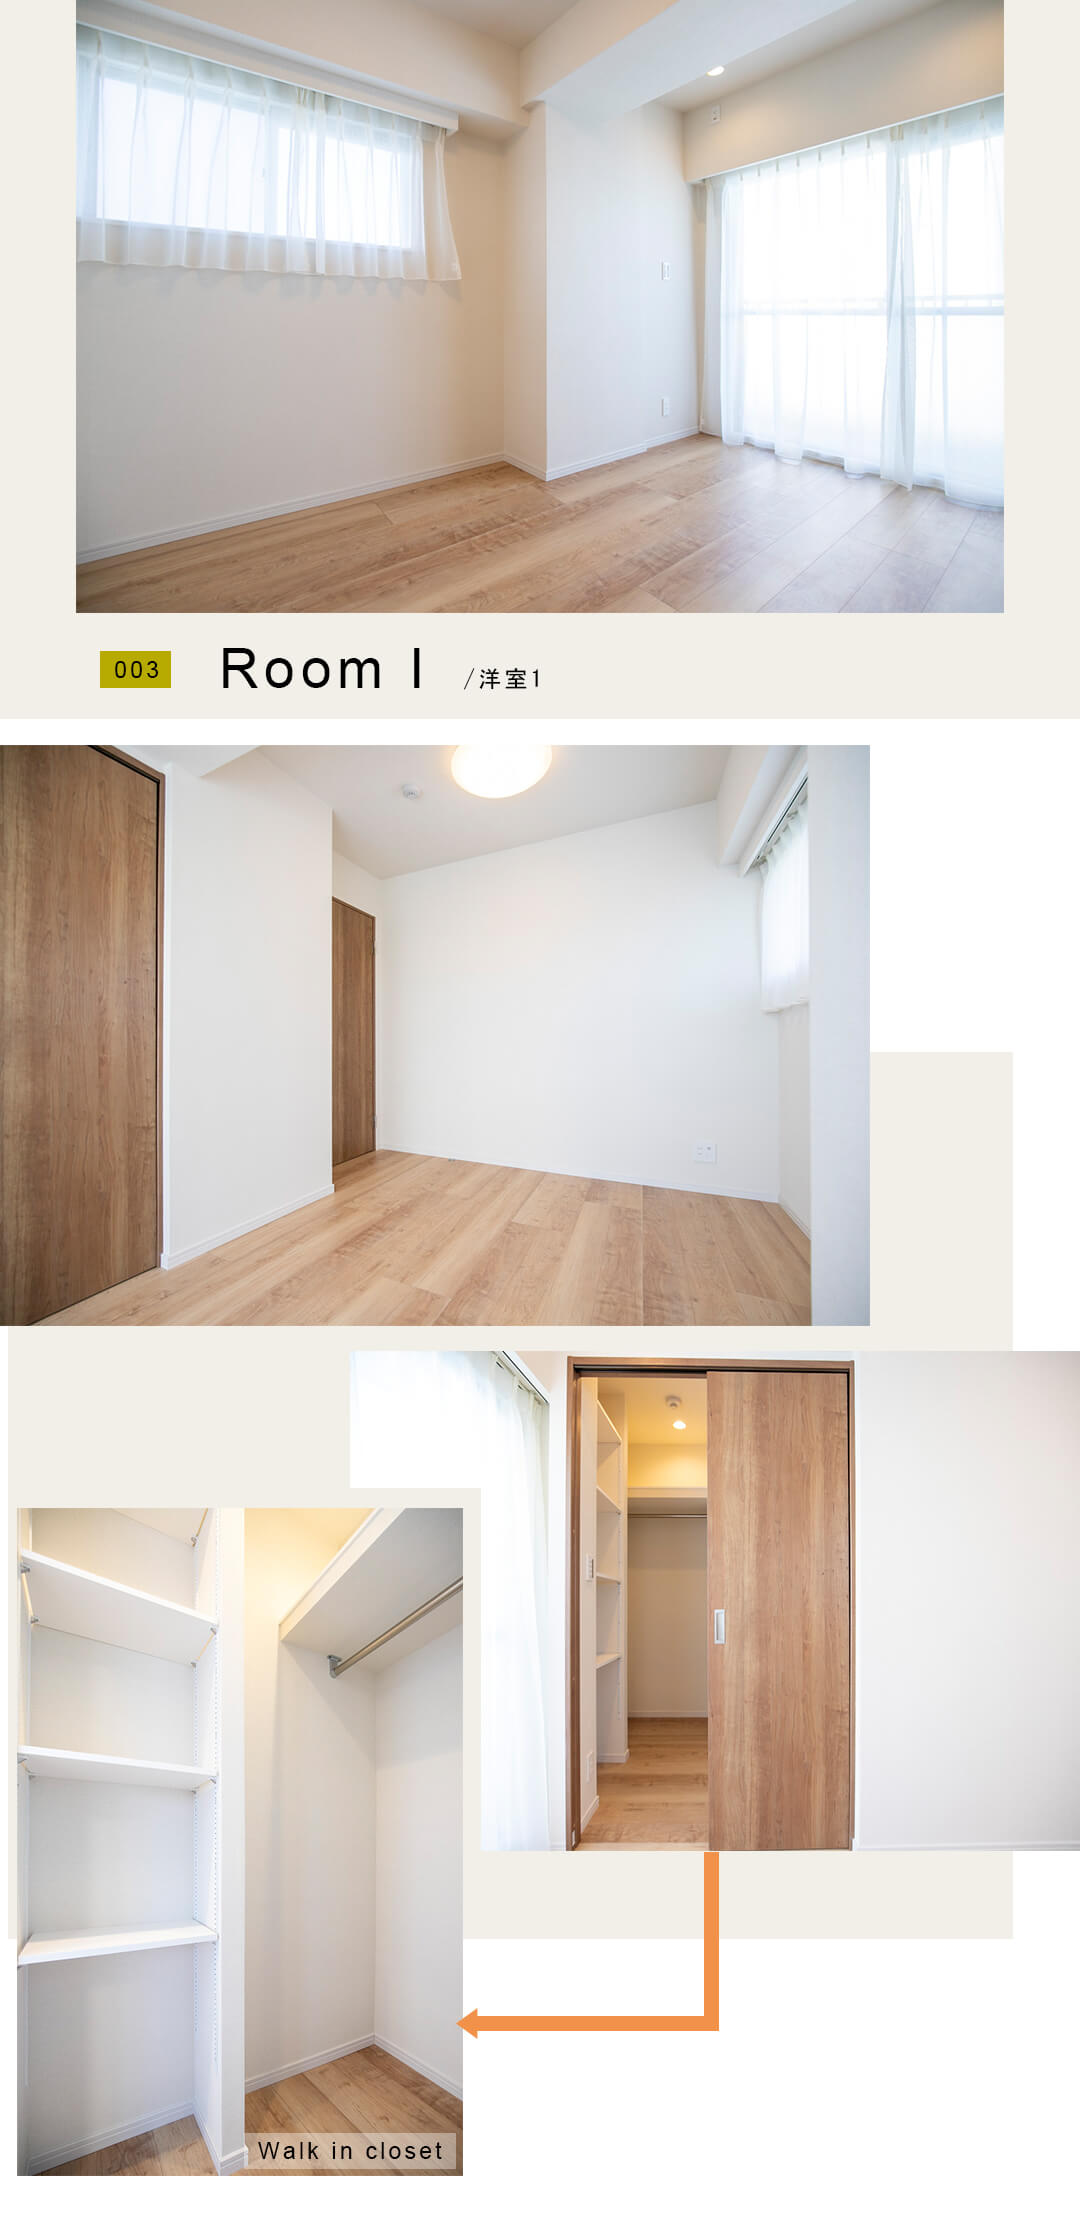 003,RoomI,洋室1